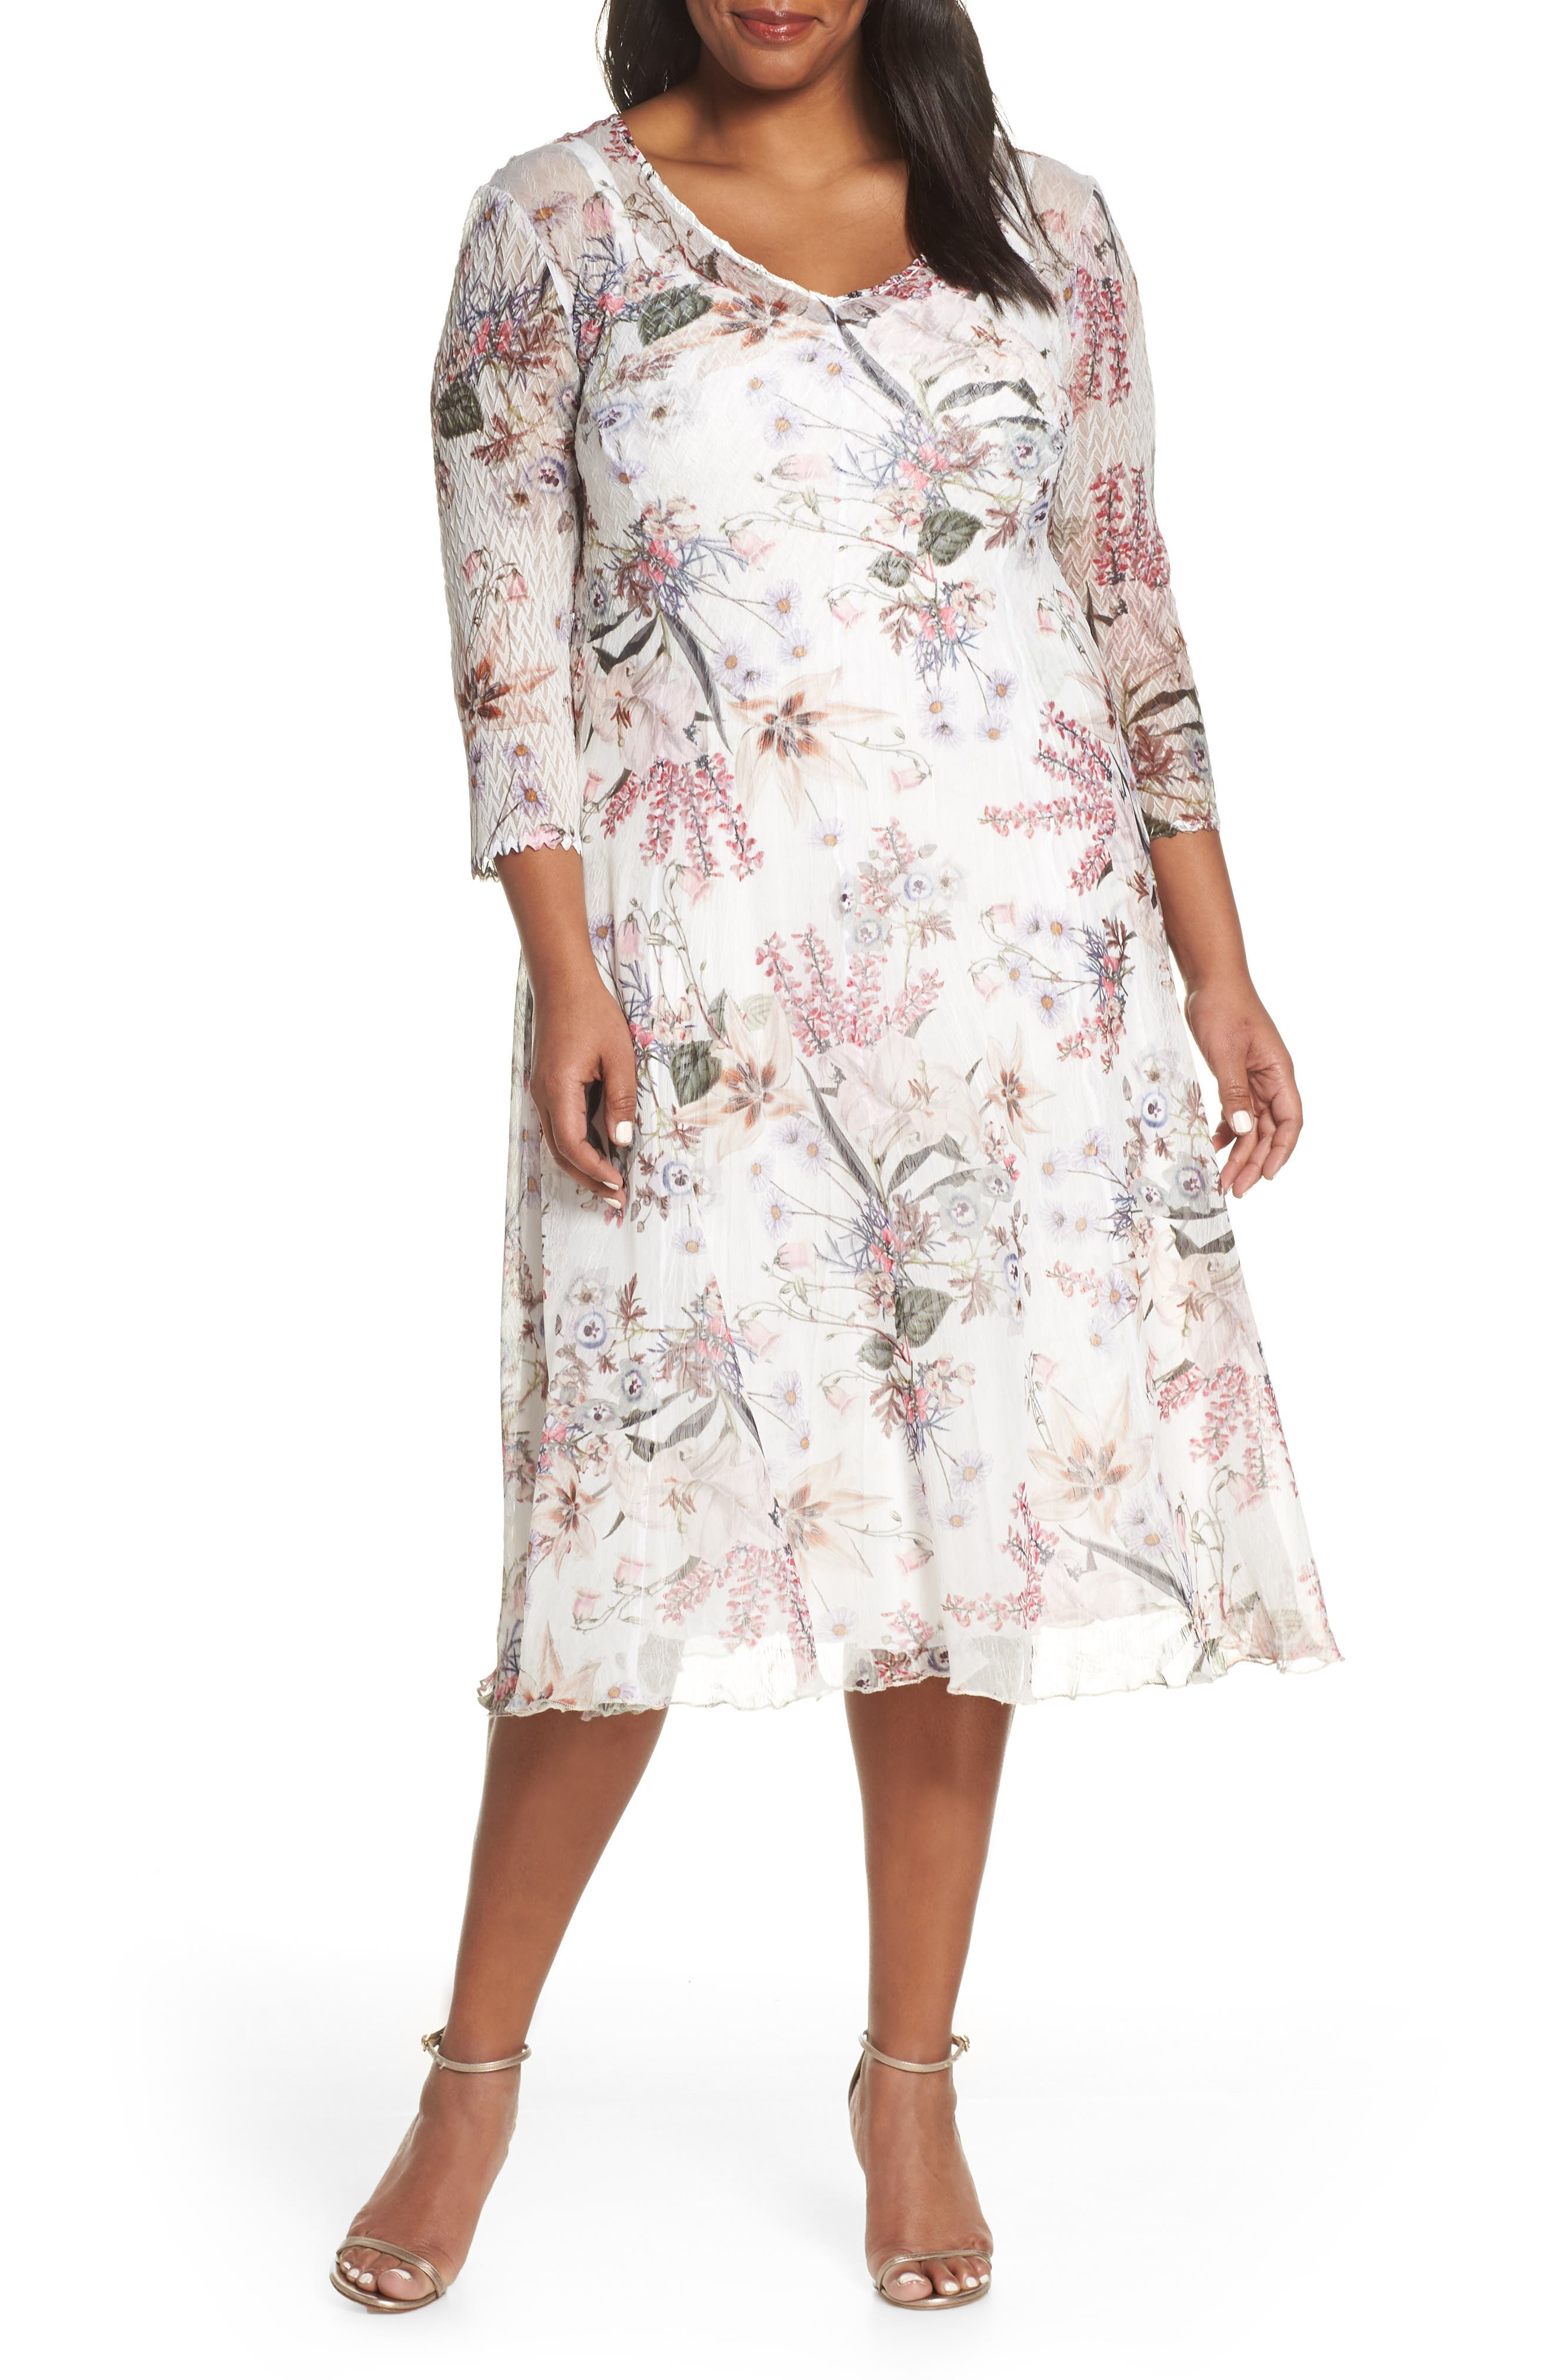 Plus Size Komarov V-Neck Floral Print Chiffon Cocktail Dress, Ivory